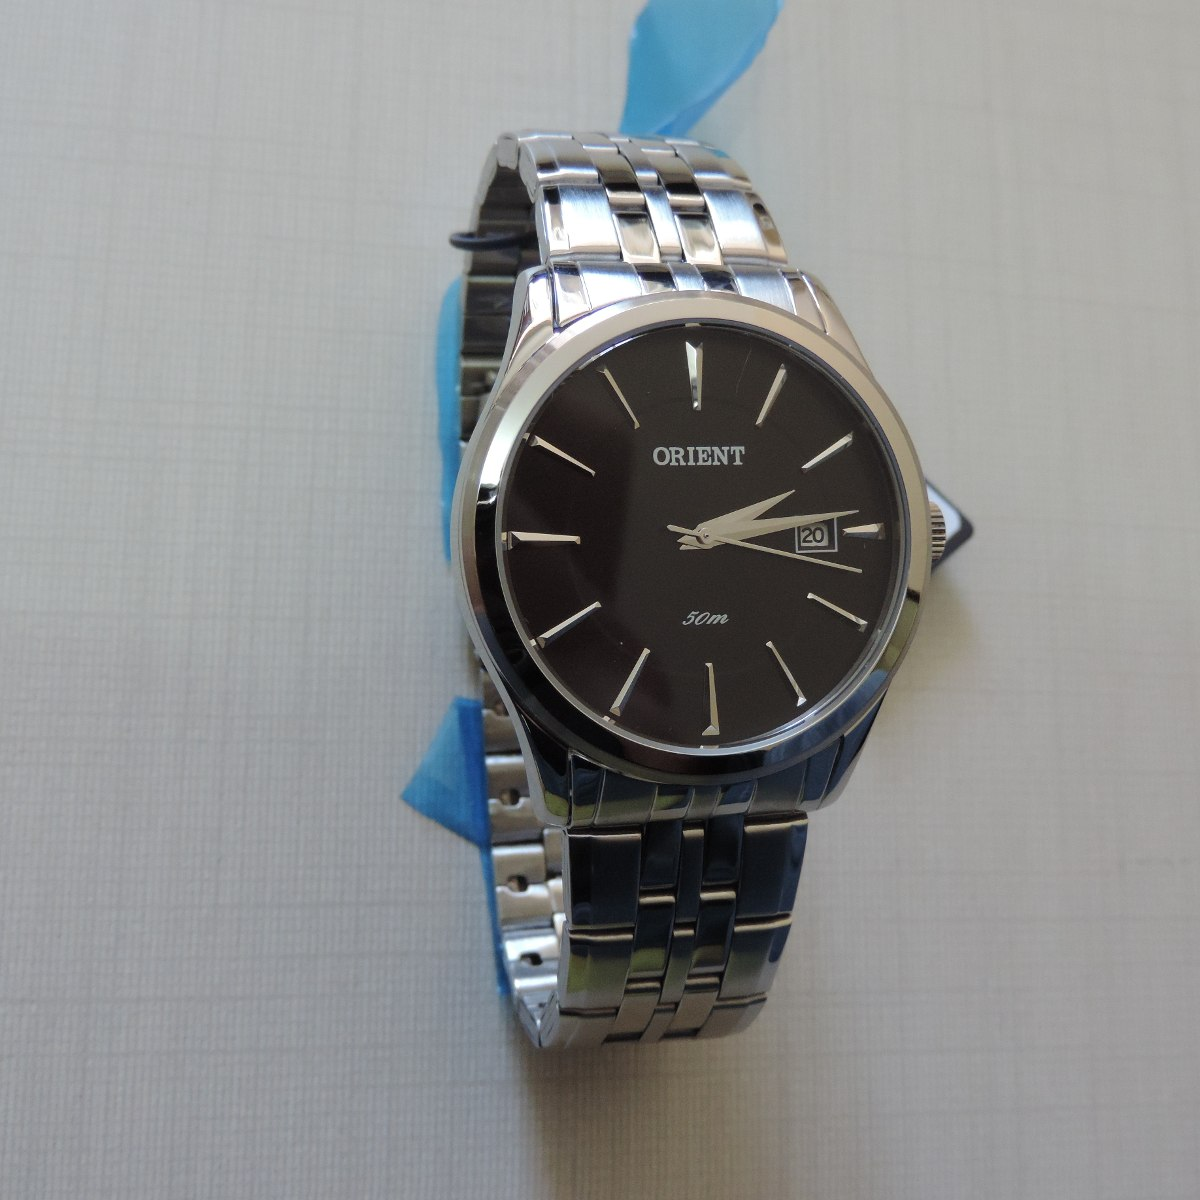 d78332aeede Relógio Orient Mbss1202 Masculino Mostrador Preto Original - R  446 ...